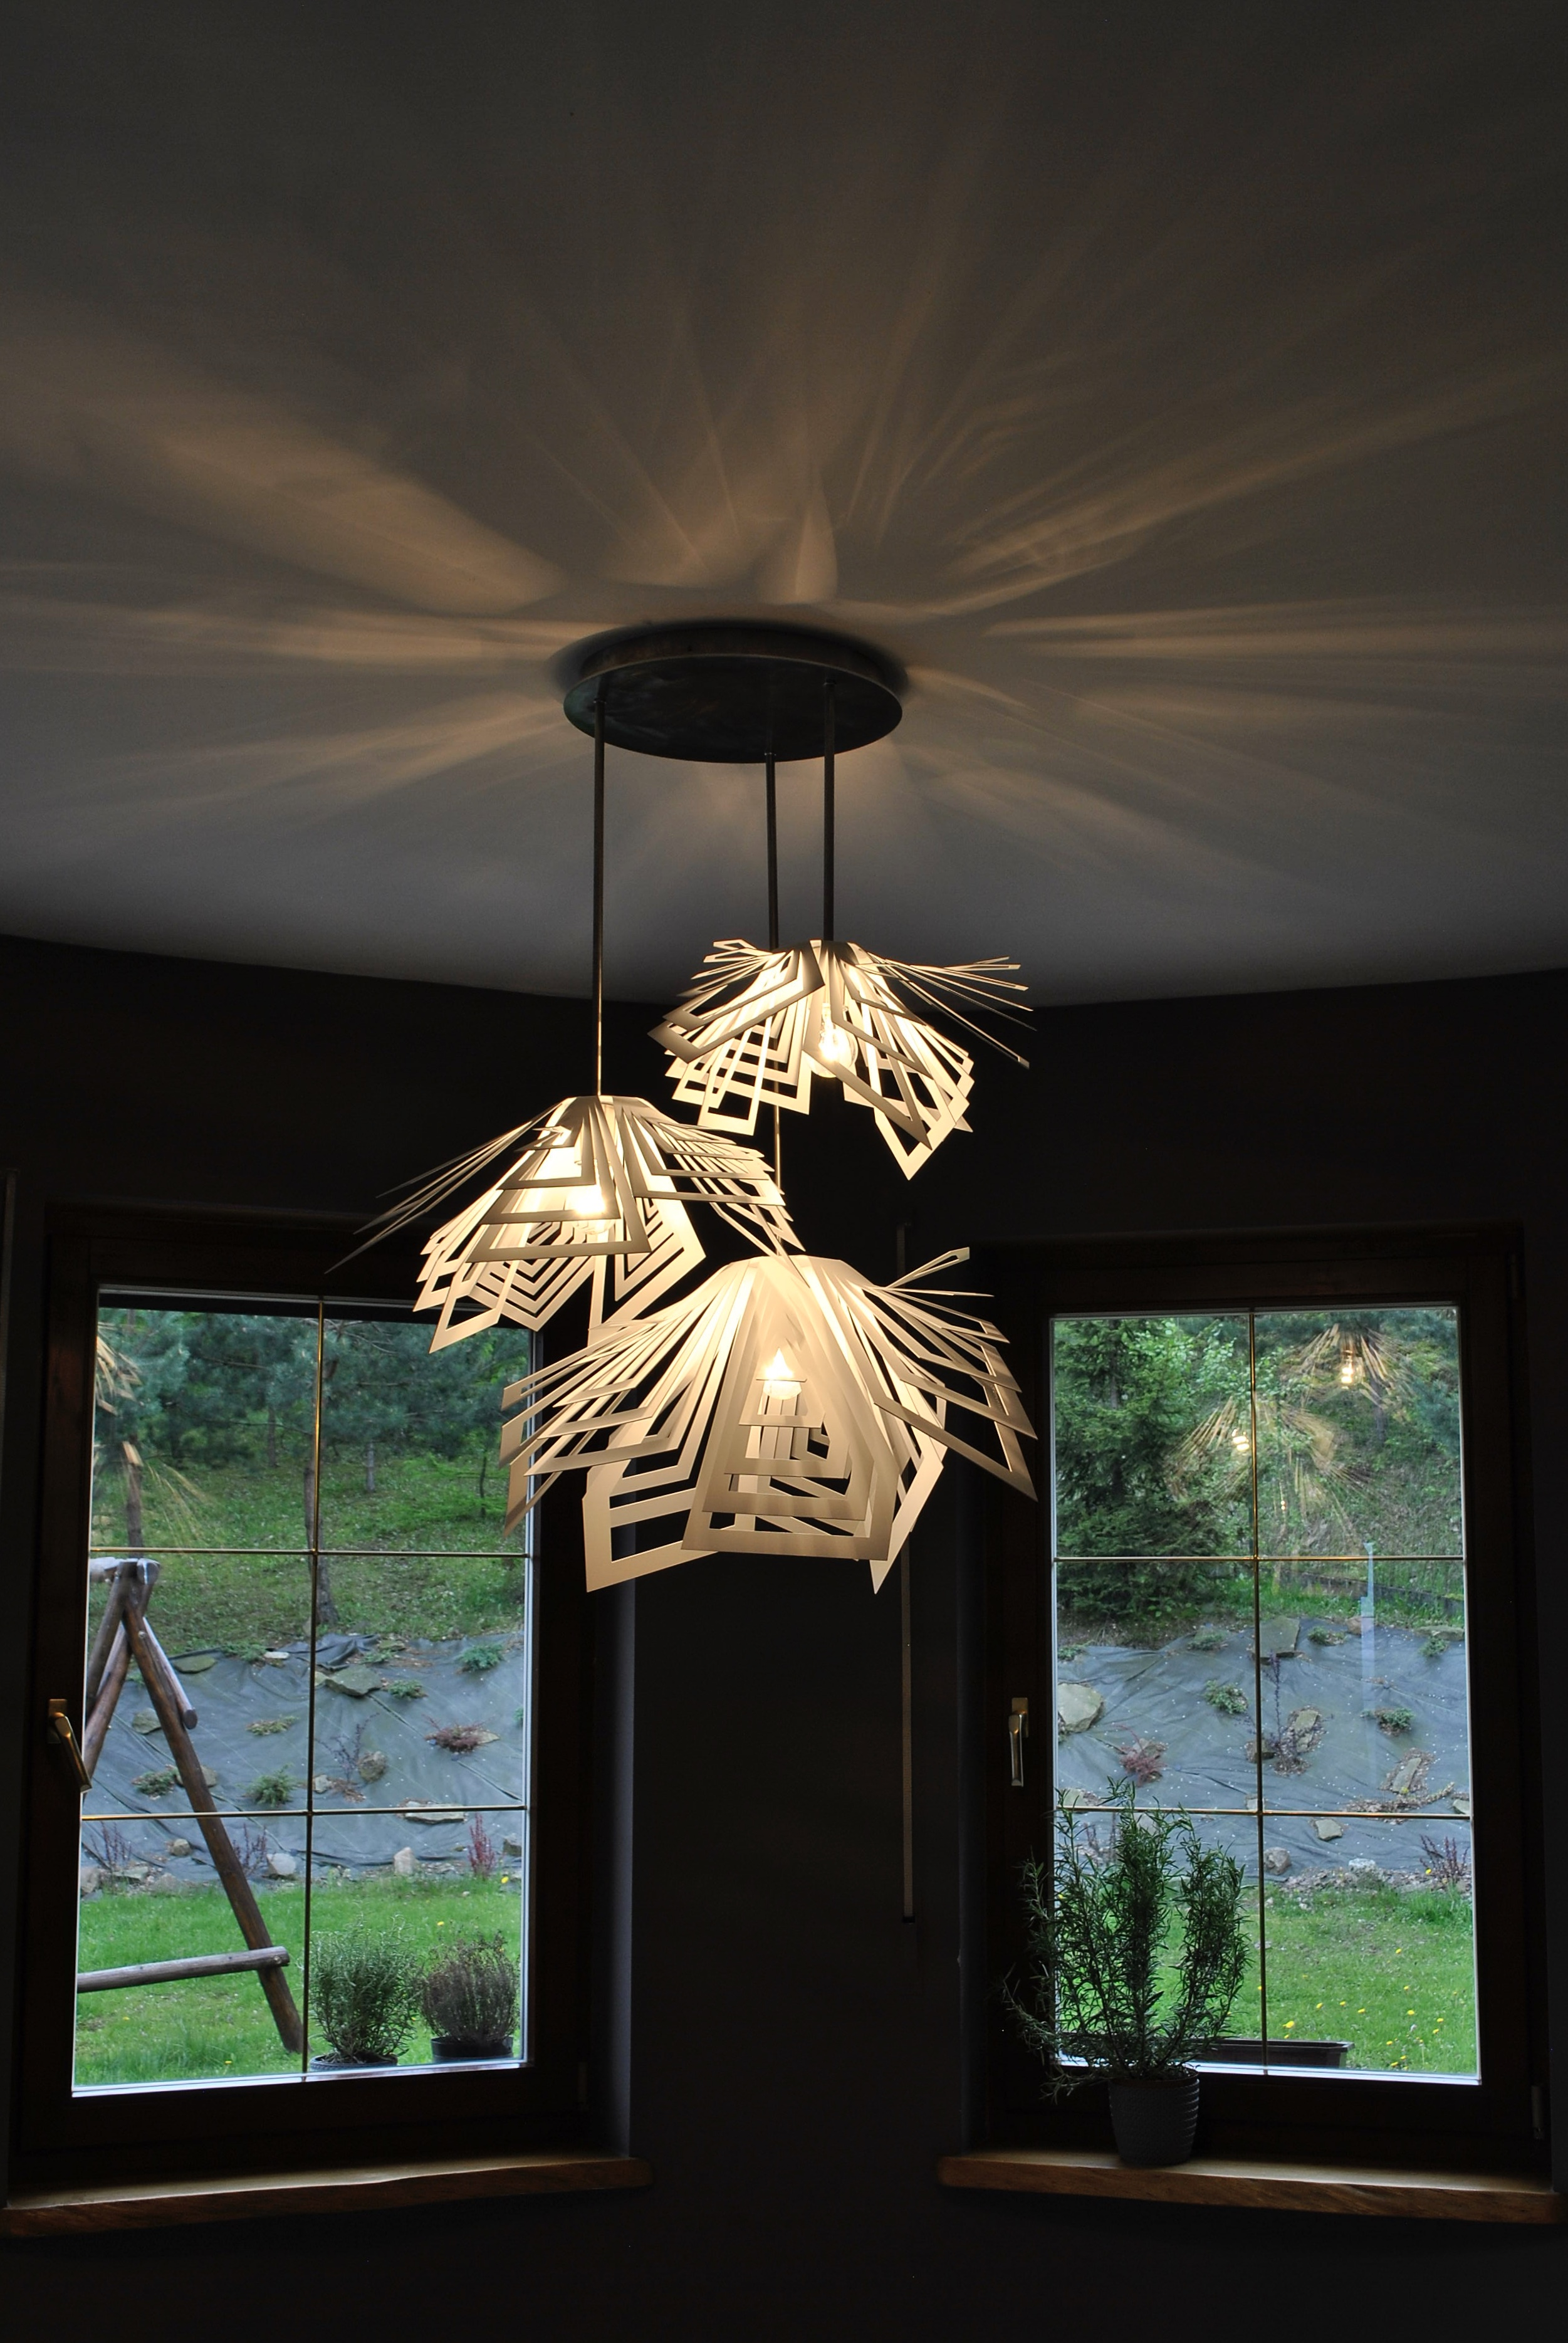 sg melodi lighting pendant ikea light en feedback lamp ceiling catalog products